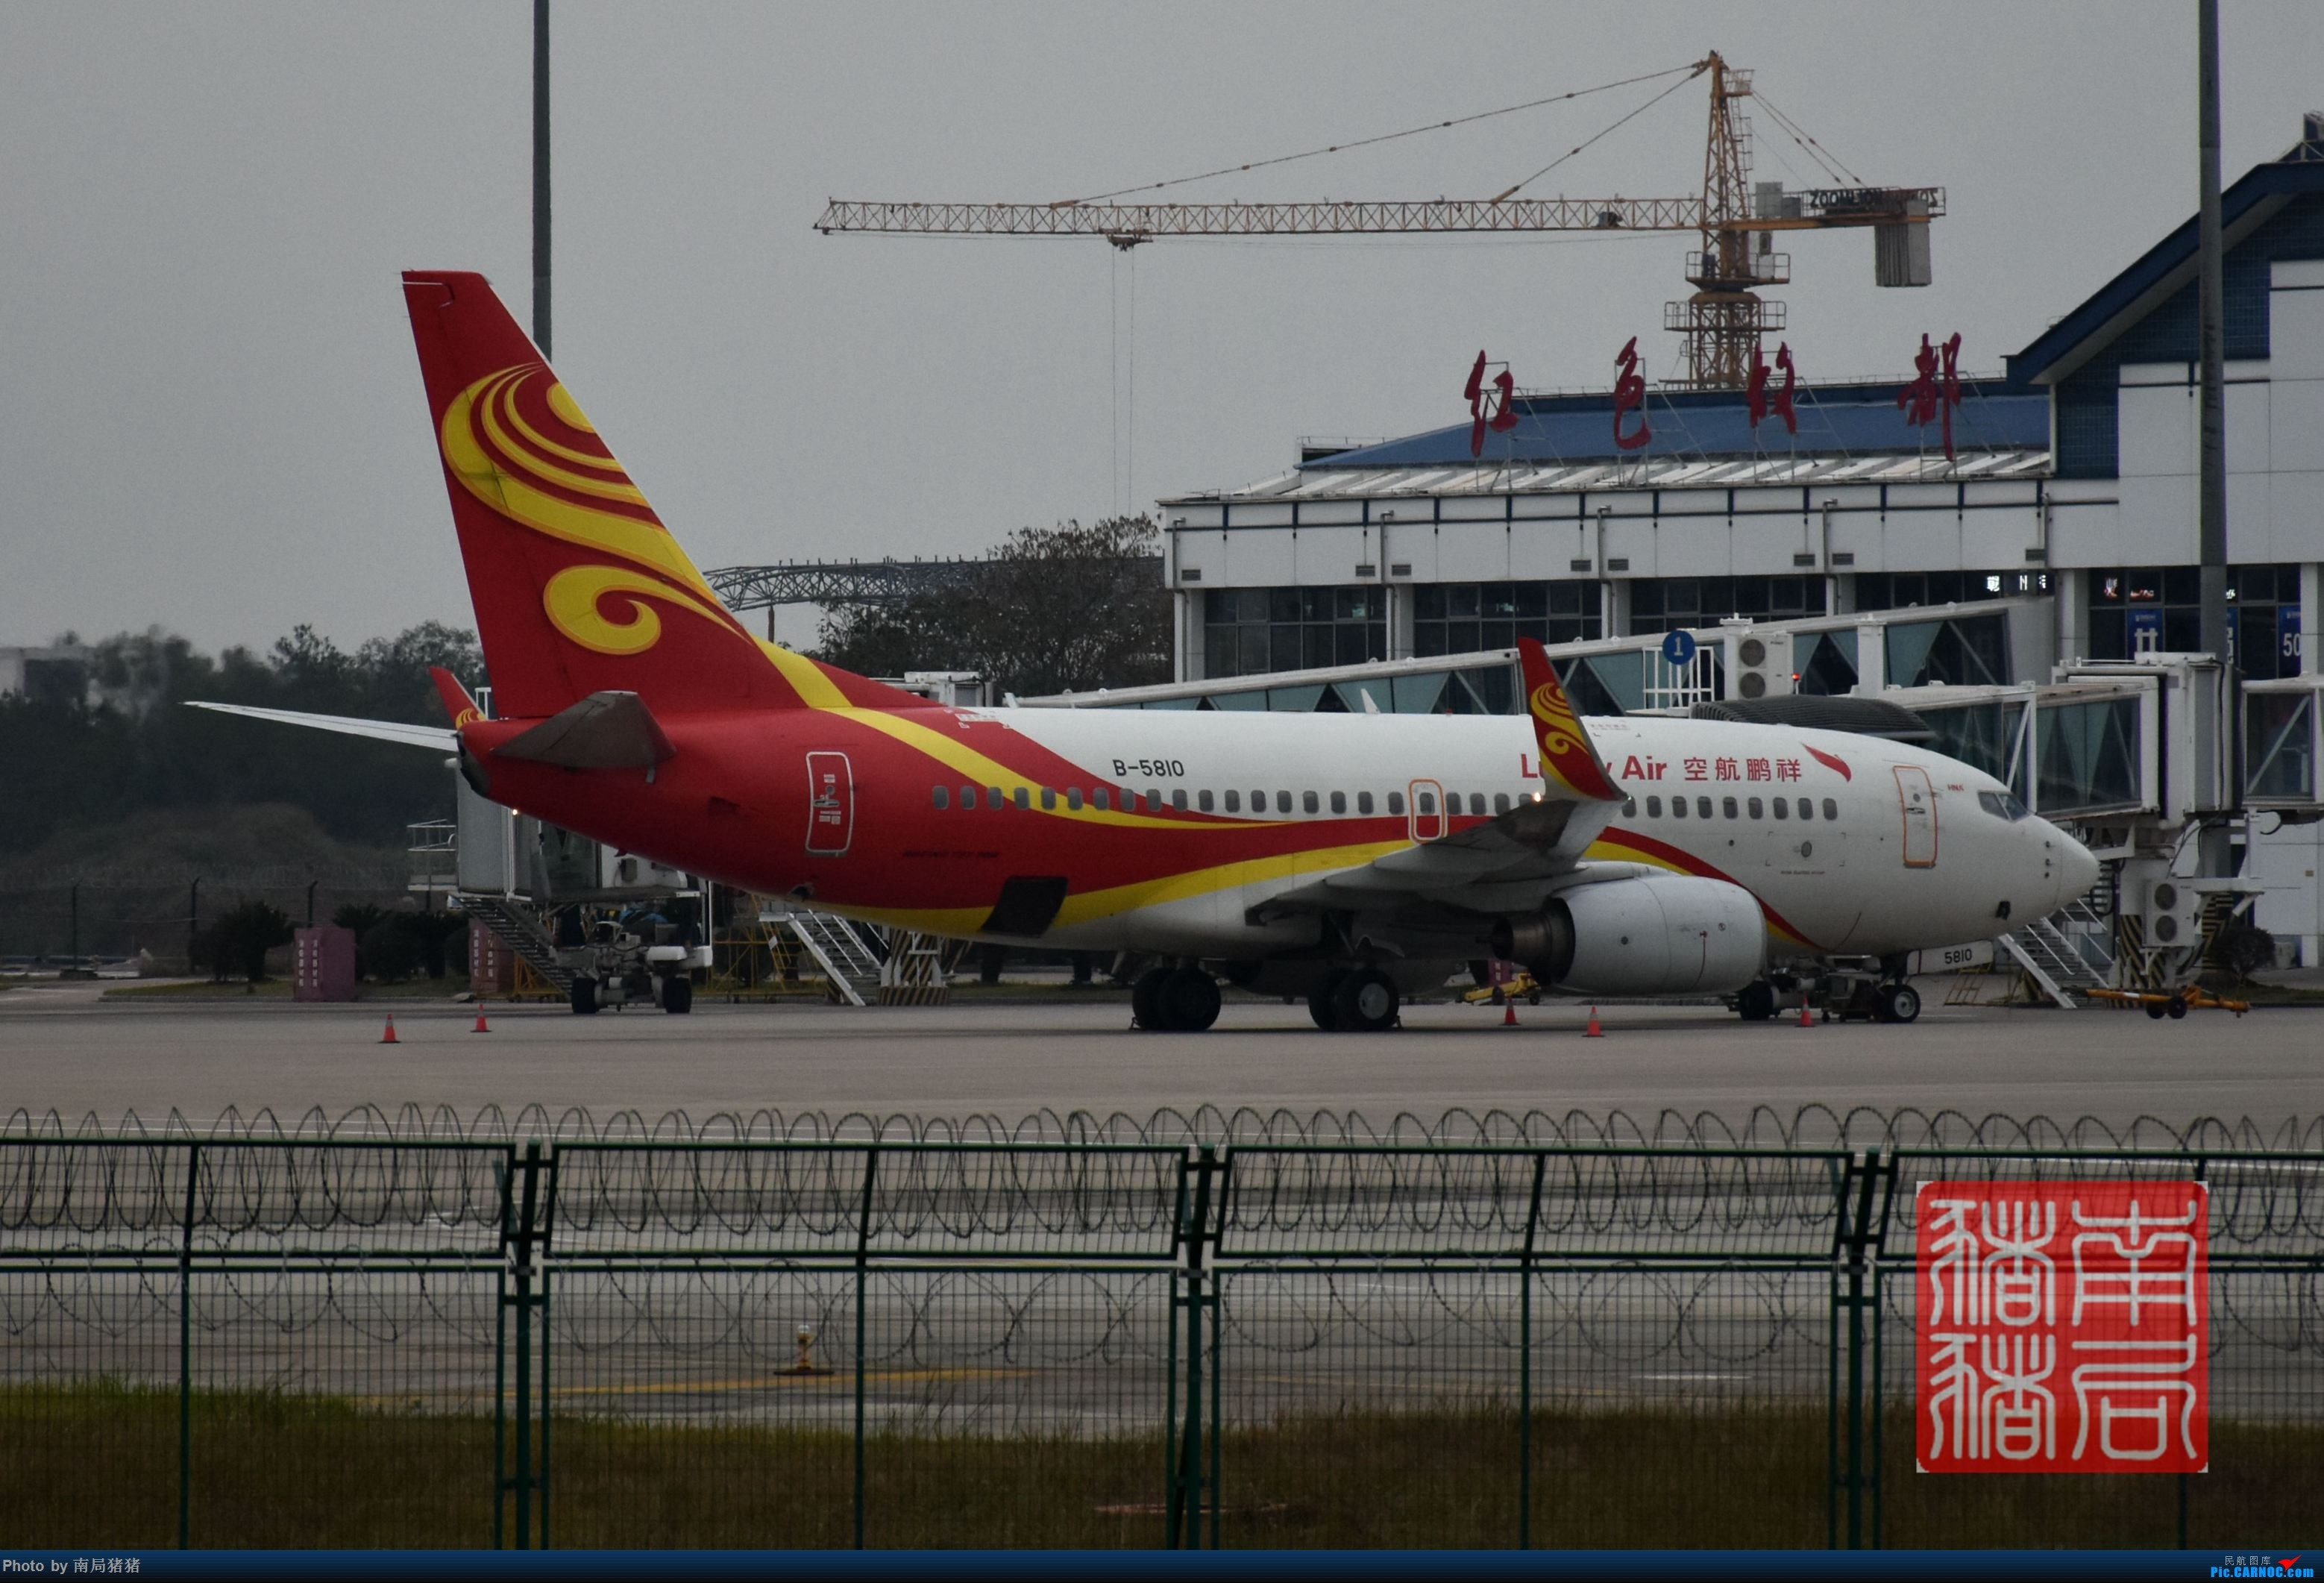 Re:[原创]KOW赣州黄金机场(通航运12,北部湾变形金刚) BOEING 737-700 B-5810 中国赣州黄金机场